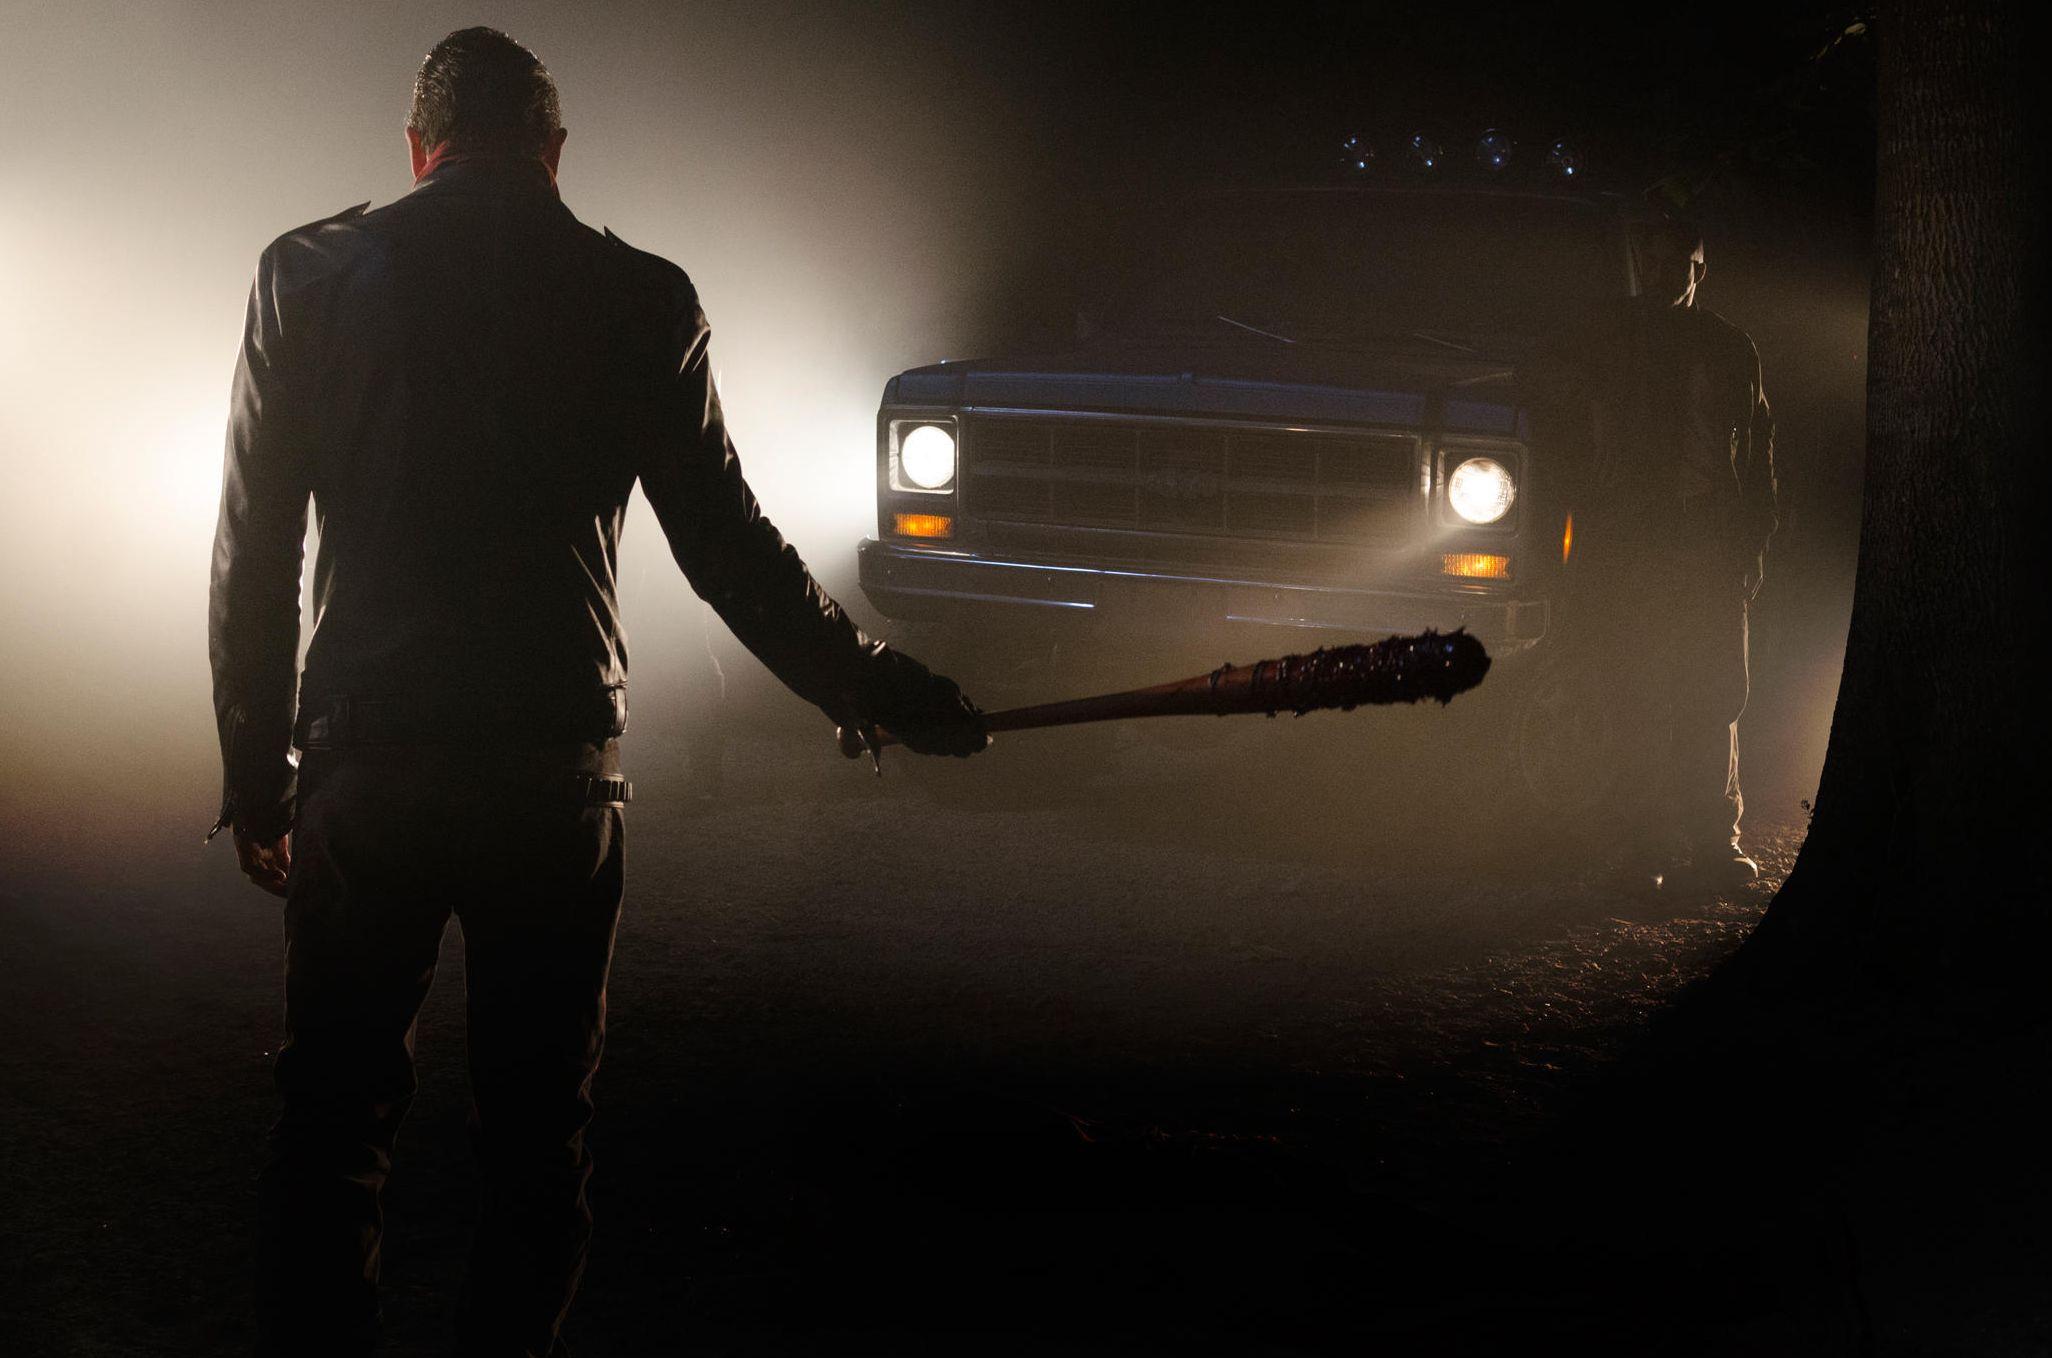 Negan, played by Jeffrey Dean Morgan